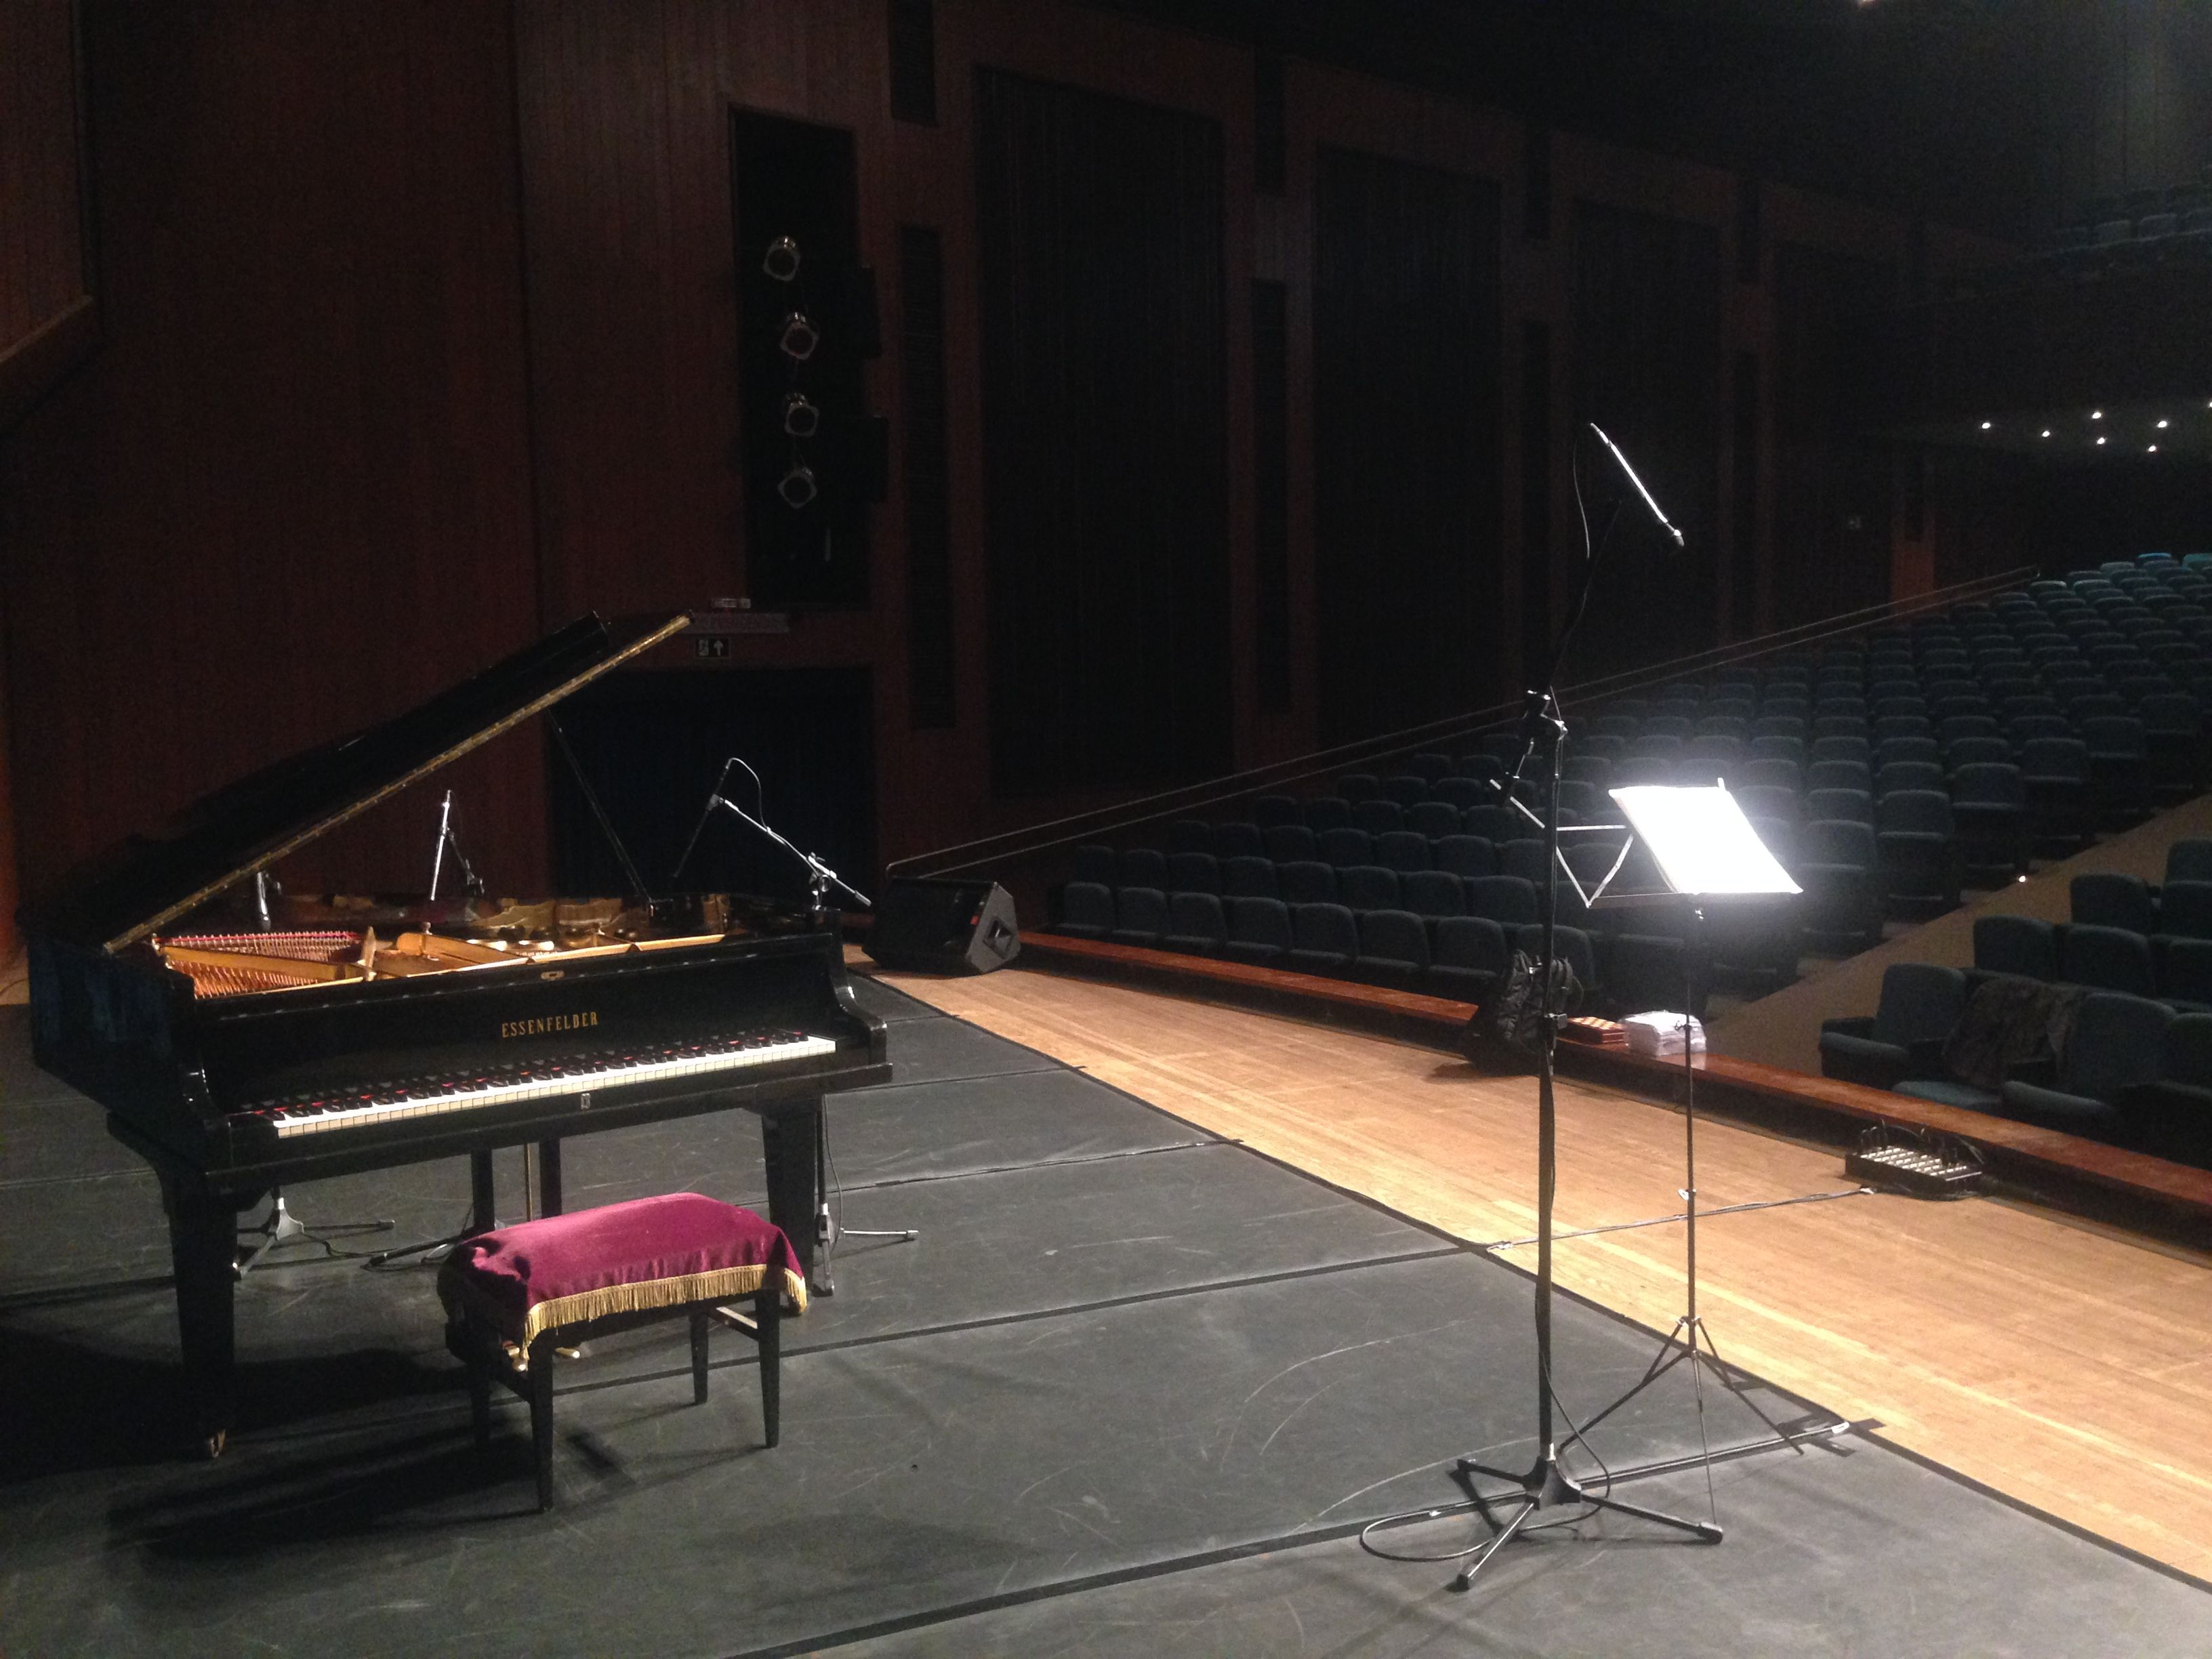 Teatro Municipal De Toledo Pr Belo Edif Cio Audit Rio Com